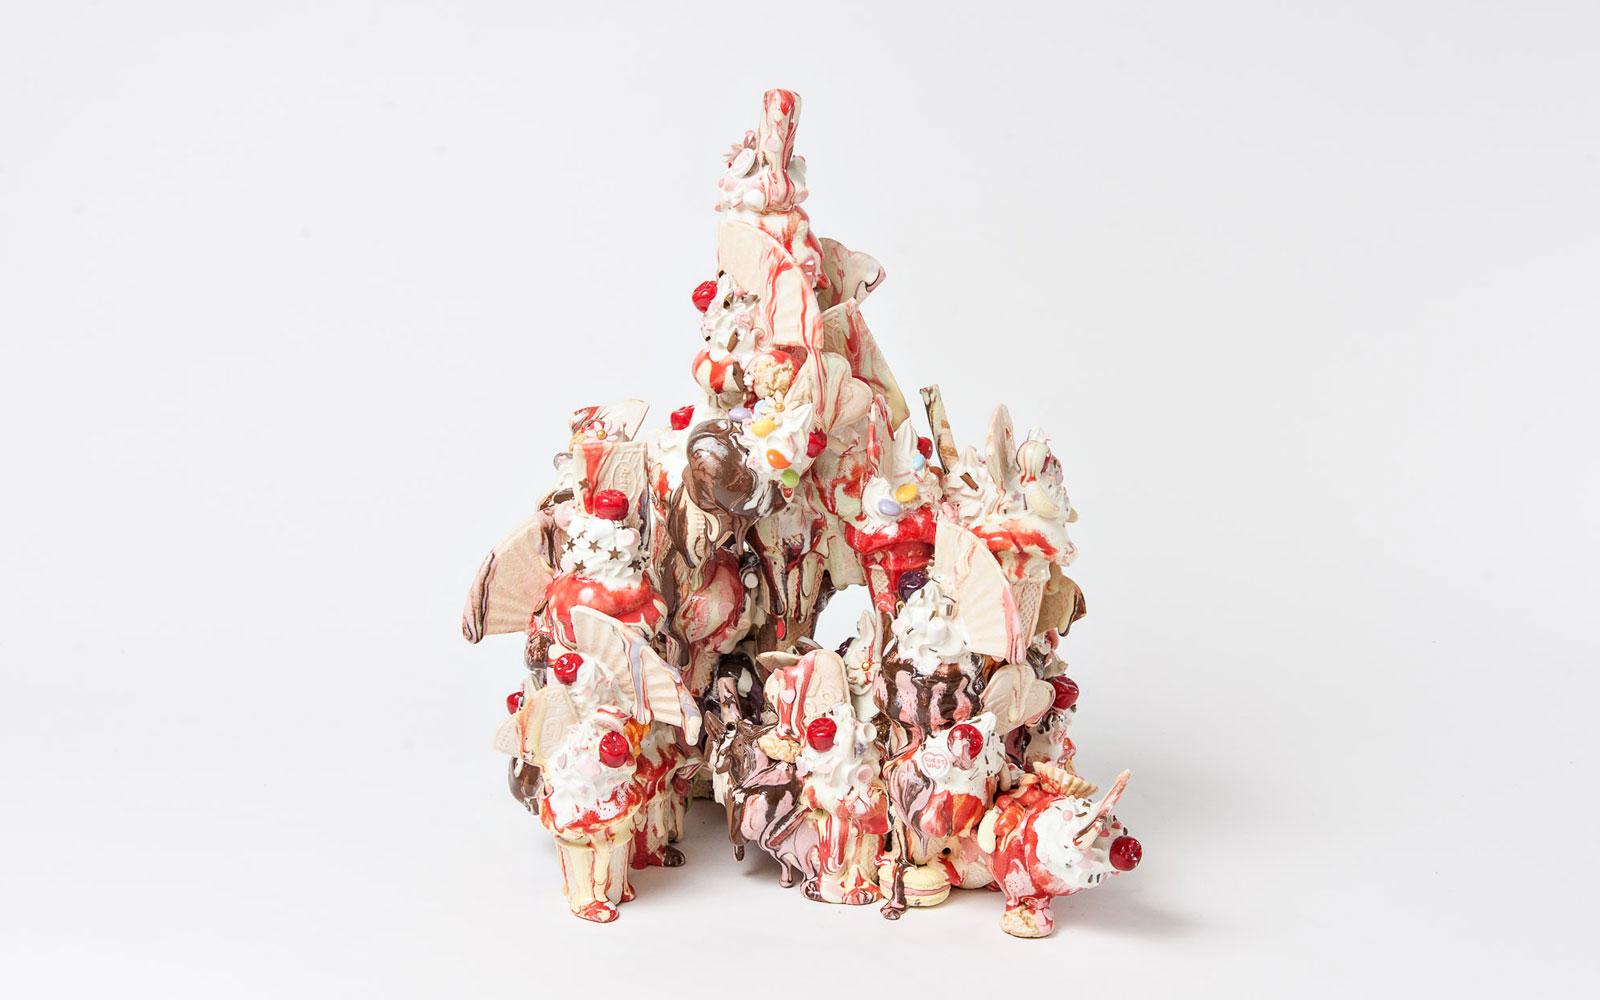 FI-anna-barlow-ceramics-ice-cream-02.jpg